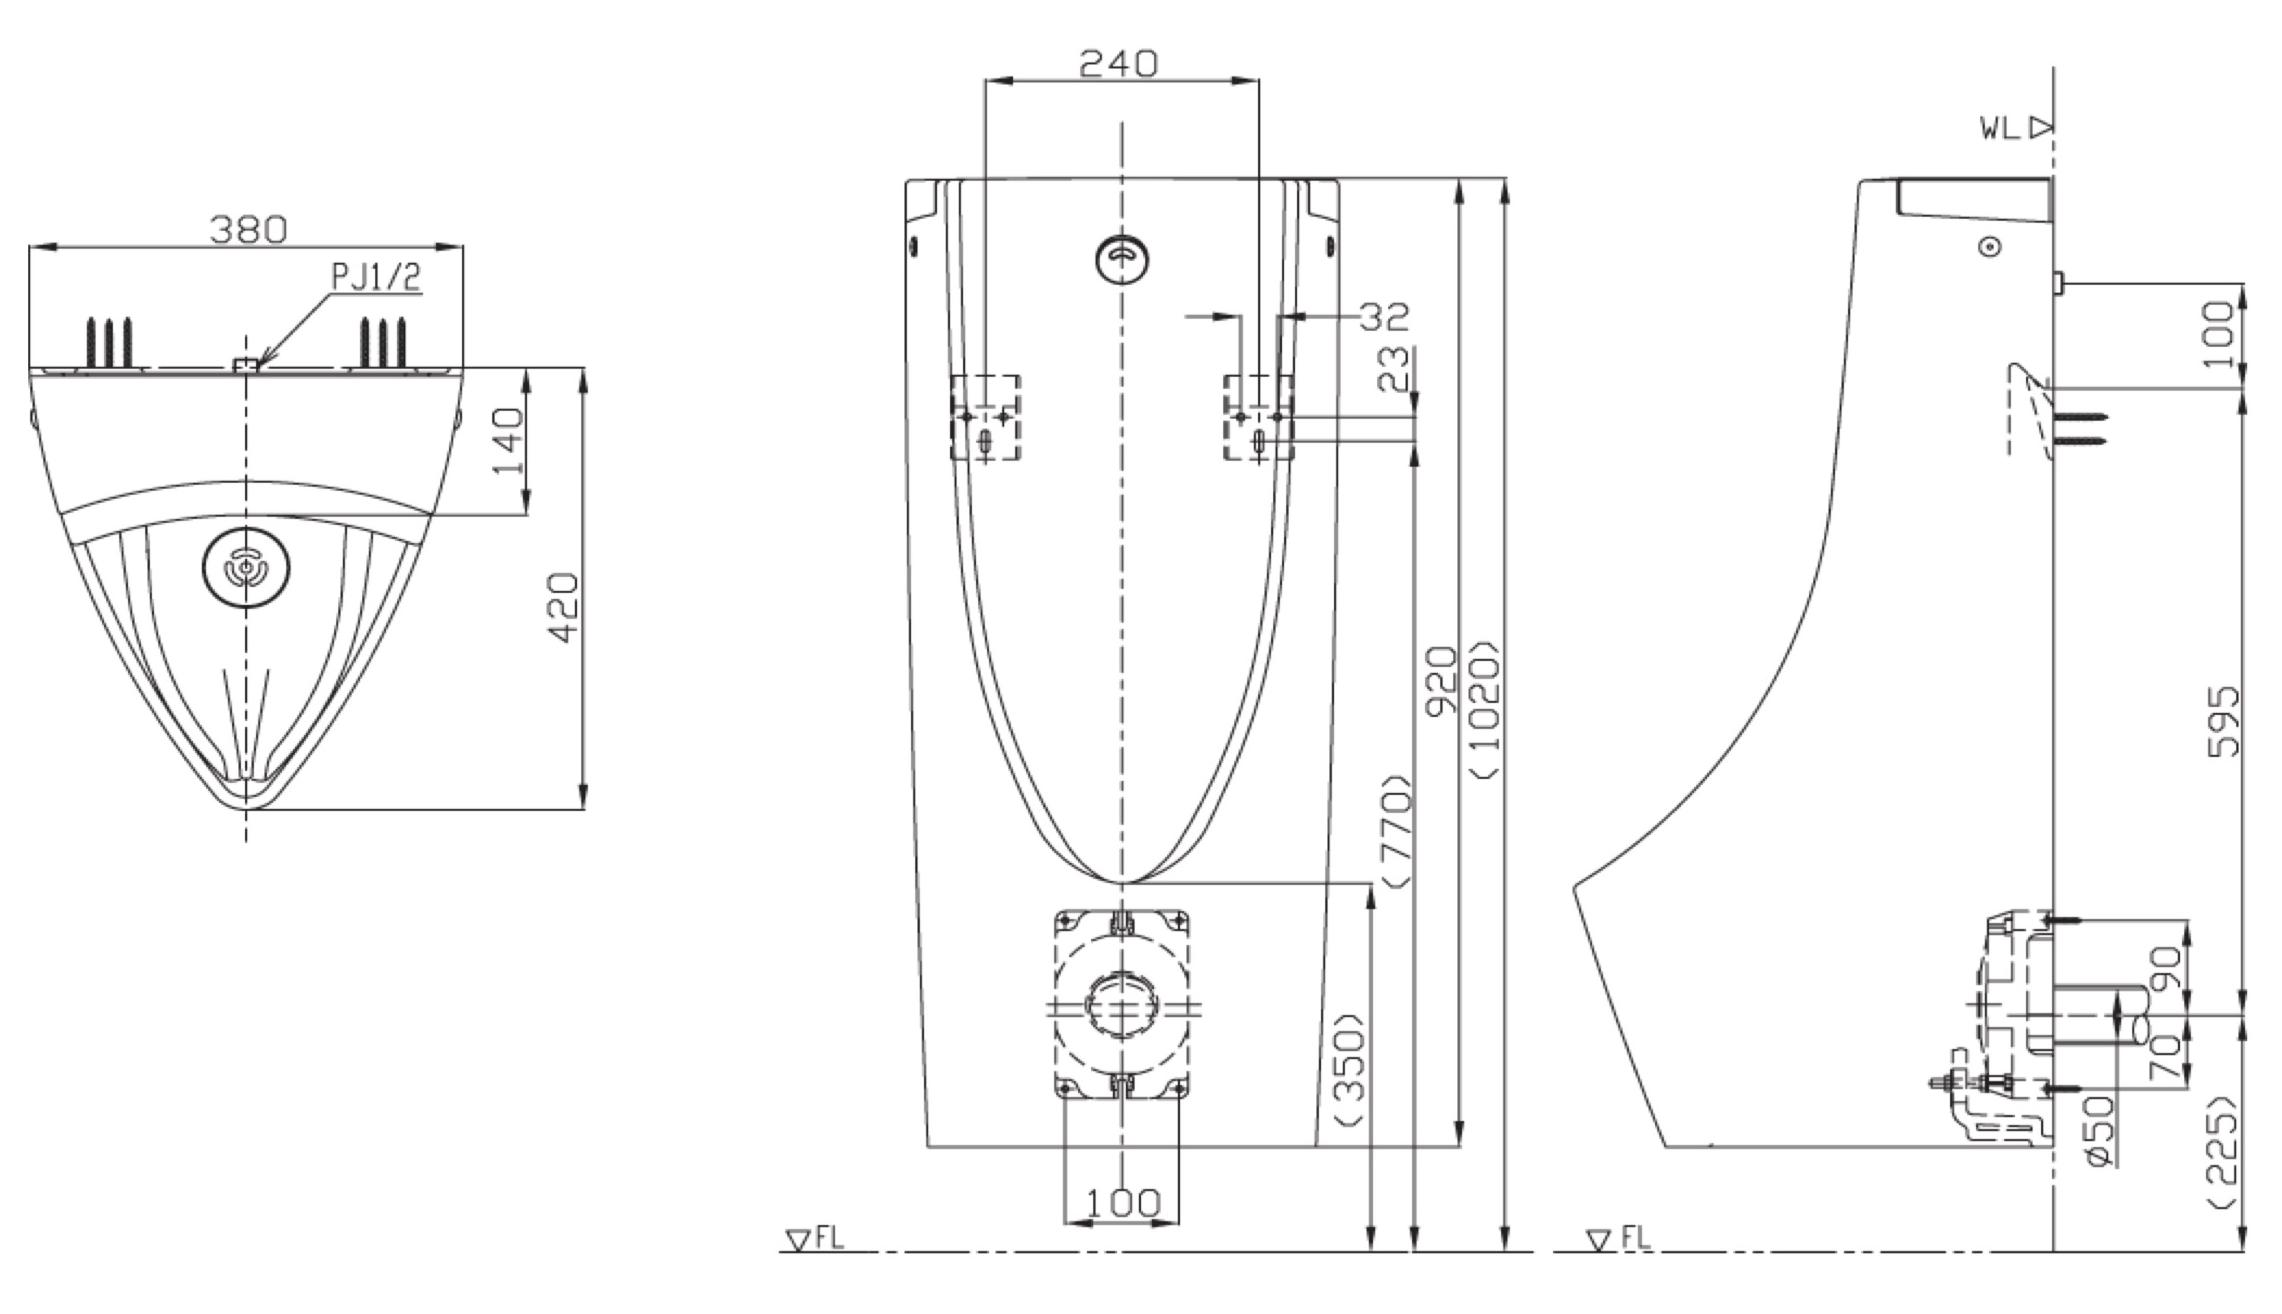 USWN900A โถปัสสาวะชายแบบแขวนผนัง พร้อมฟลัชวาล์วระบบเซ็นเซอร์ในตัว (แบตเตอรี่) - TOTO